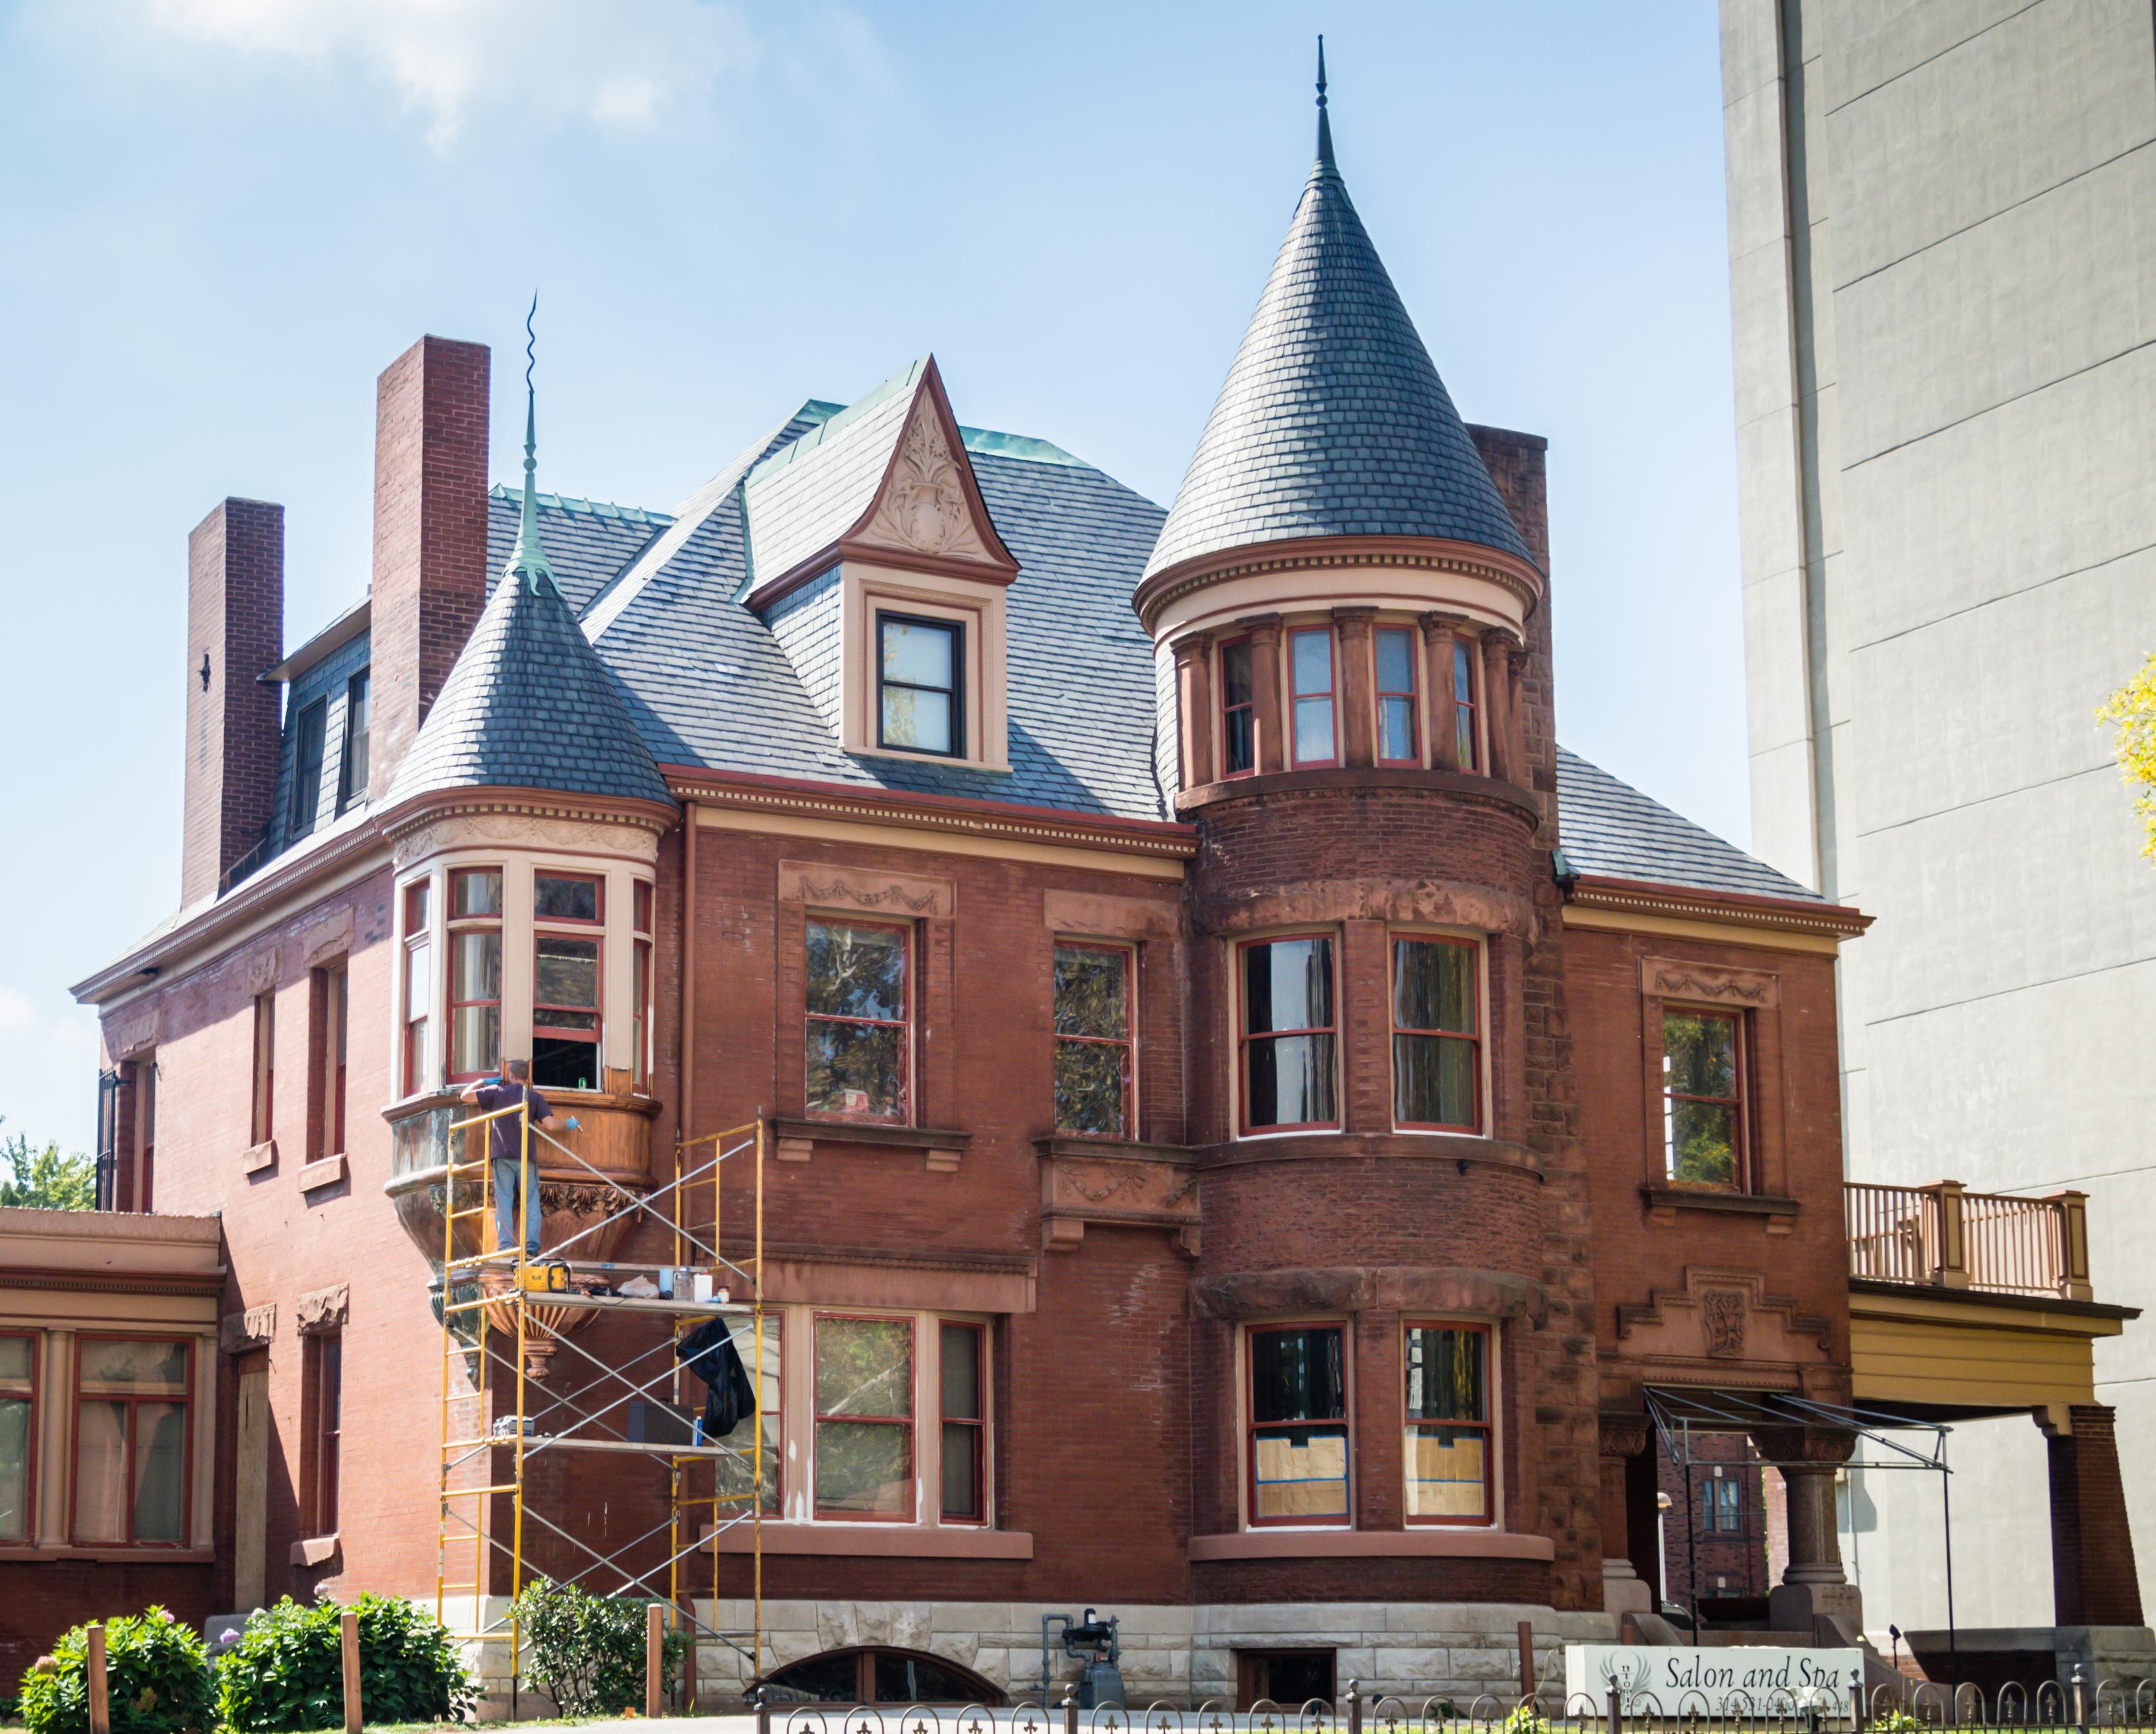 Central West End City Apartments Historic Building